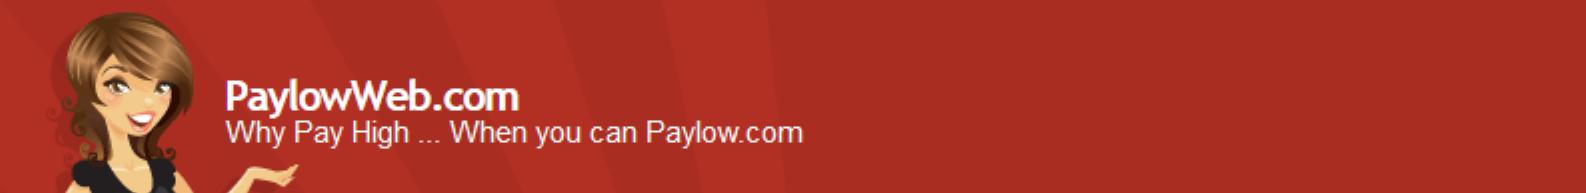 PaylowWeb.com